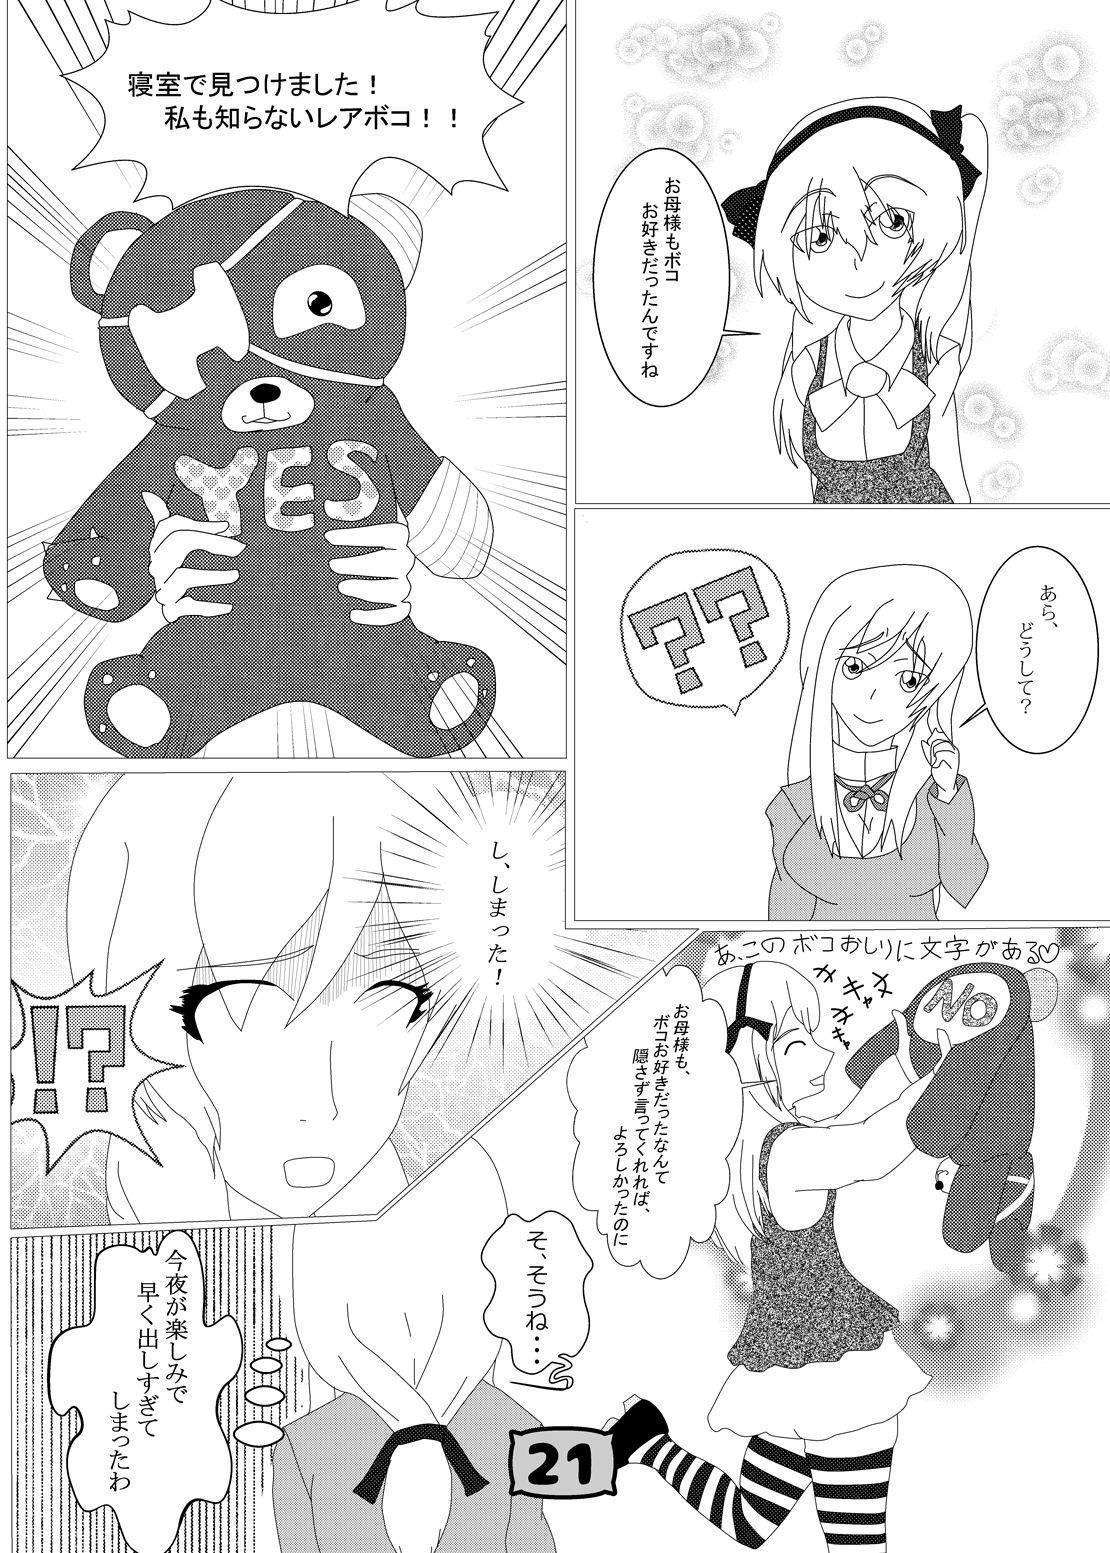 GirlPan YES/NO Makura Goudoushi 16